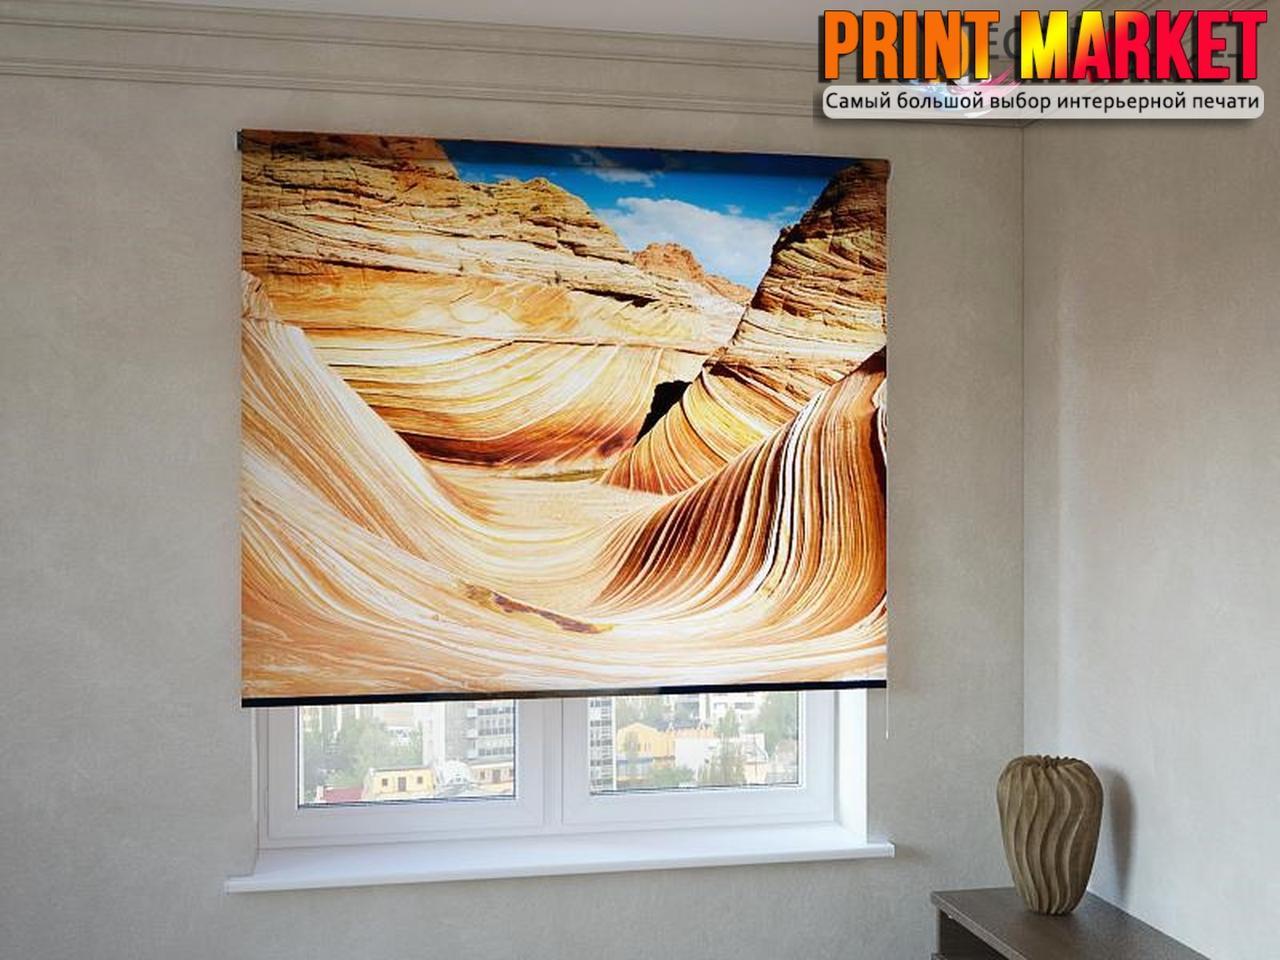 Рулонные шторы с фотопечатью скалы 3д